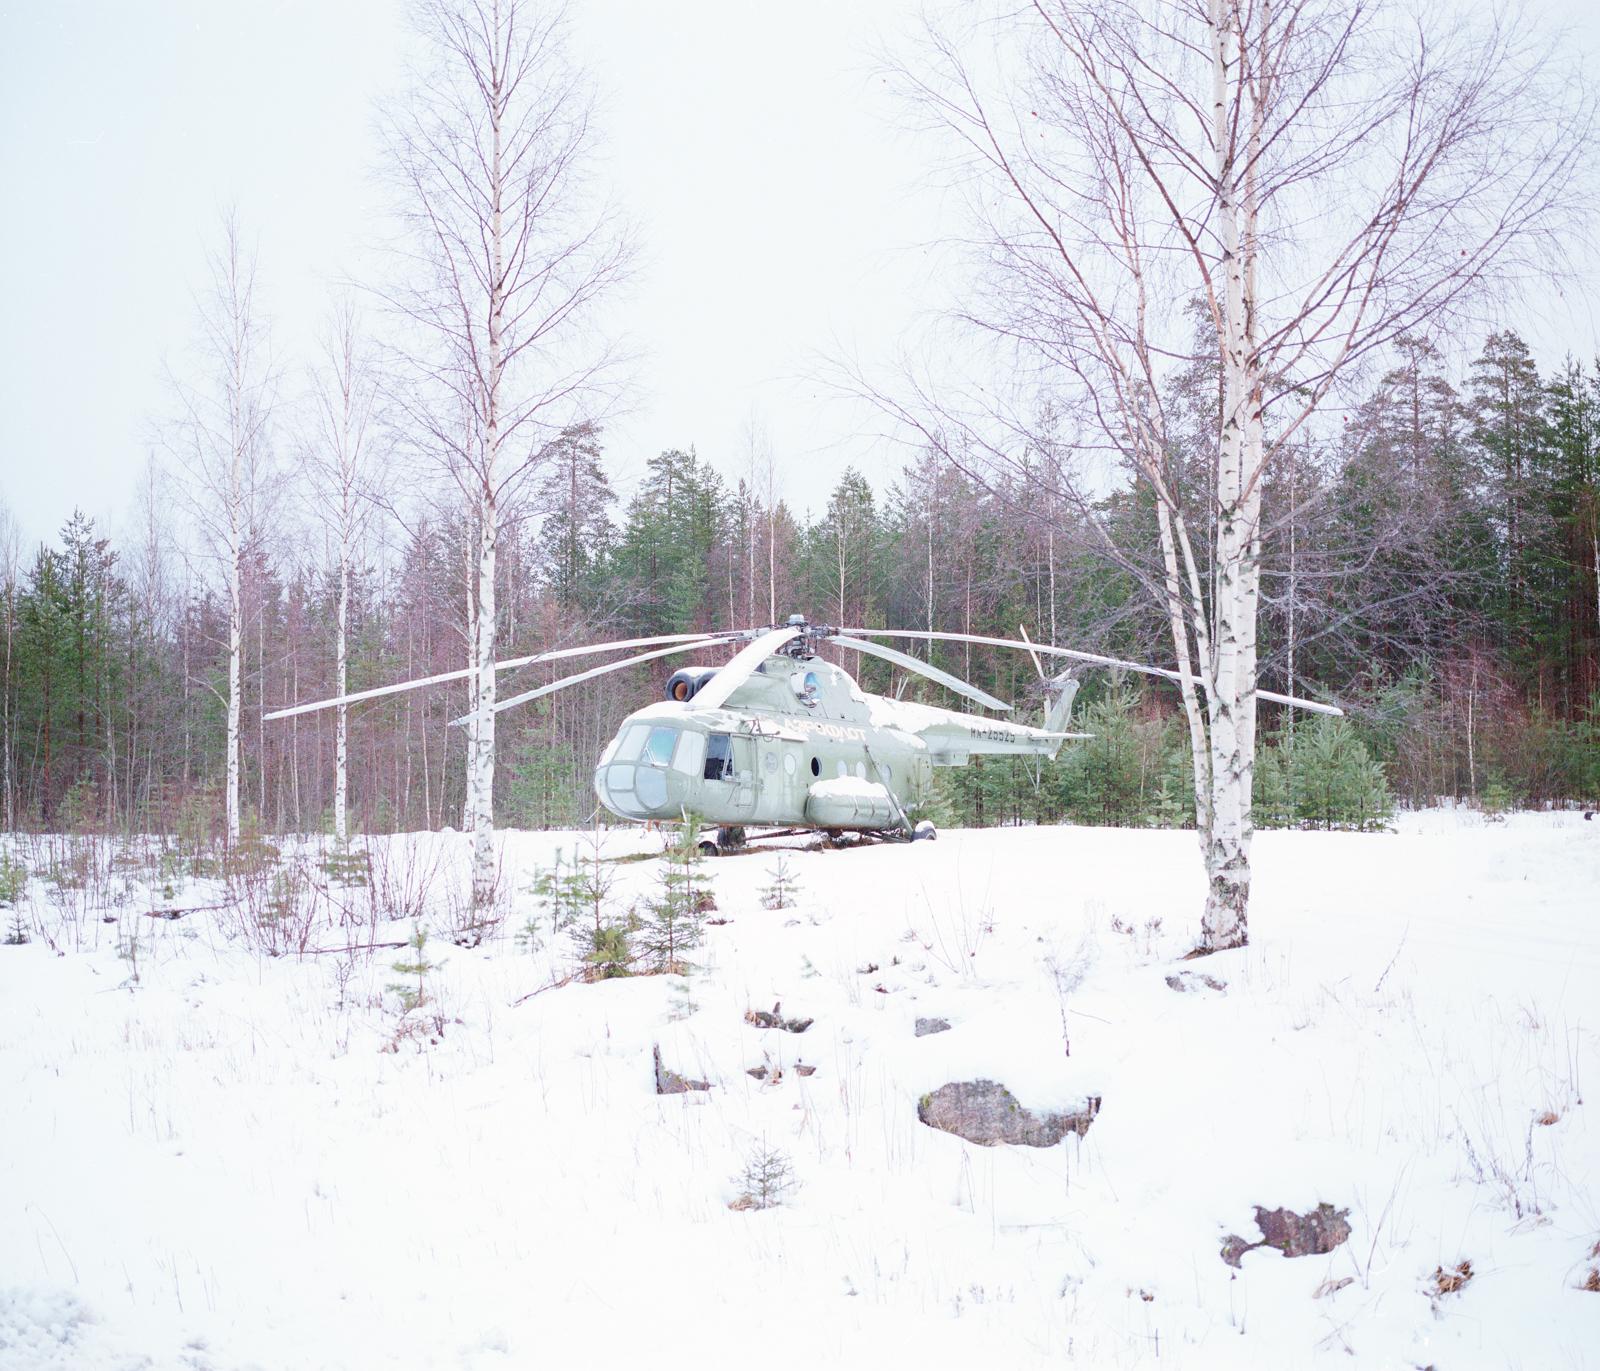 Lapland-7.jpg